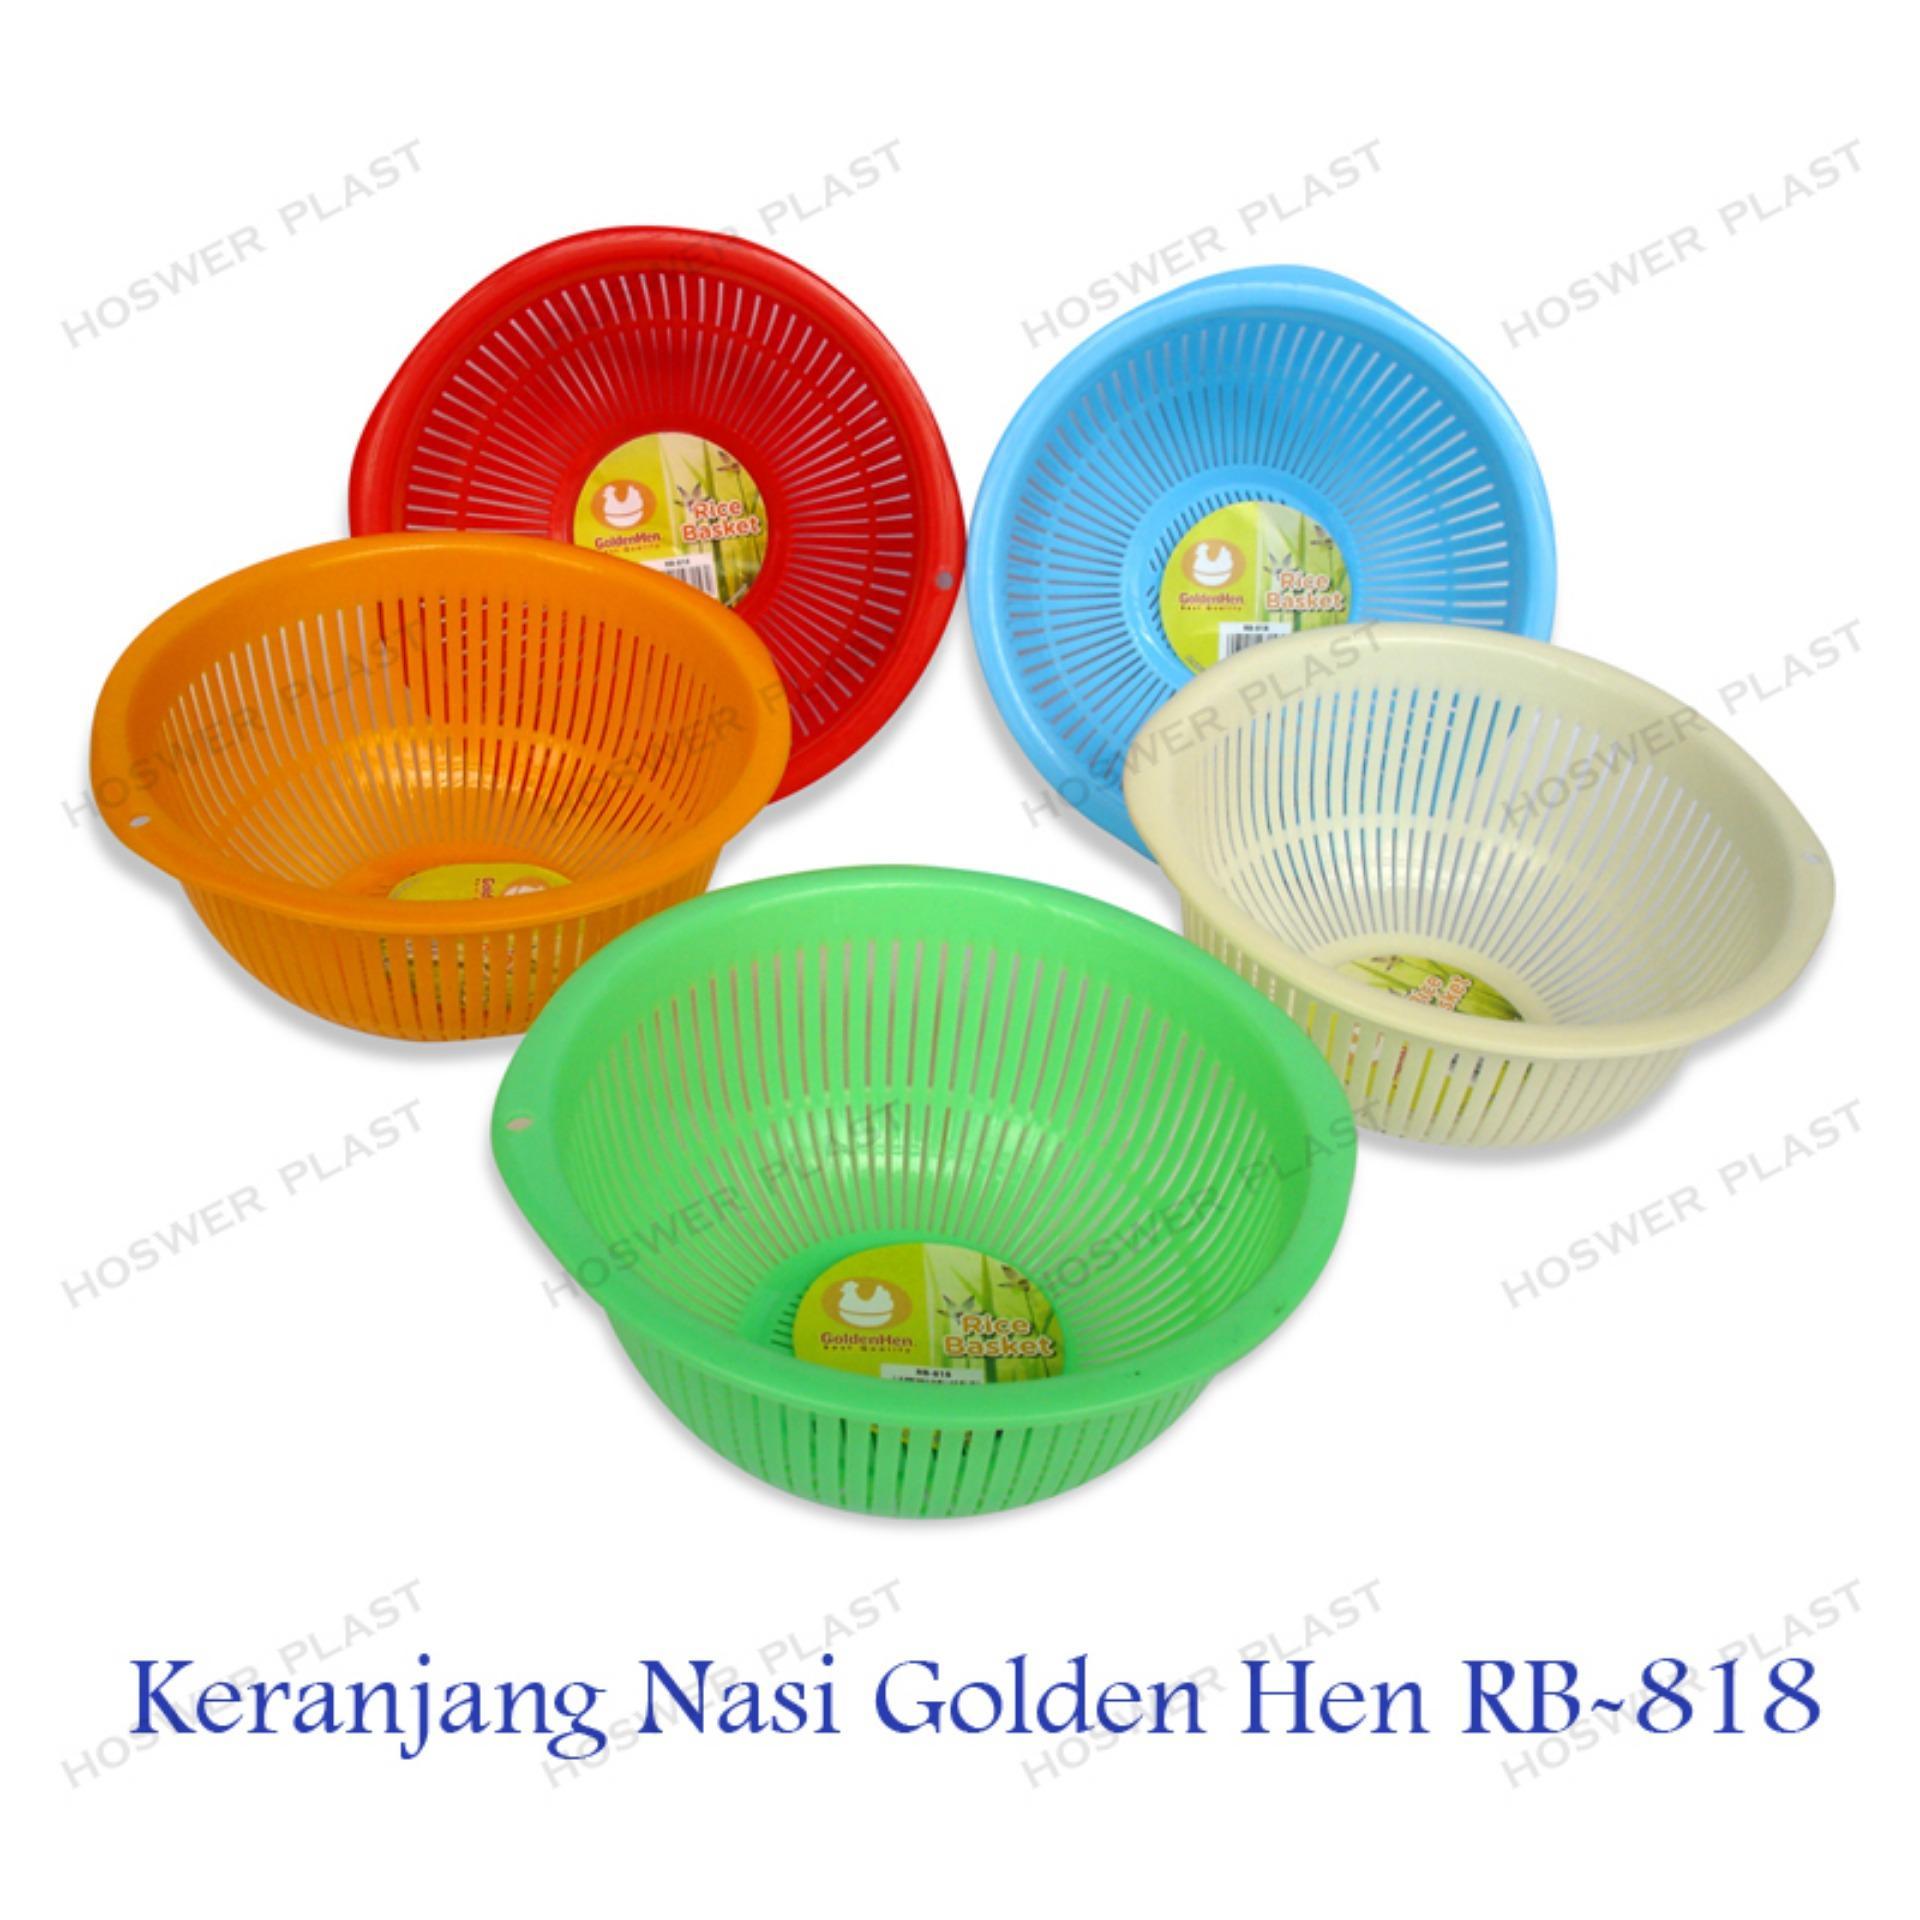 6 Bh Golden Hen Keranjang Nasi Plastik Rb - 818 By Hoswer Plast.